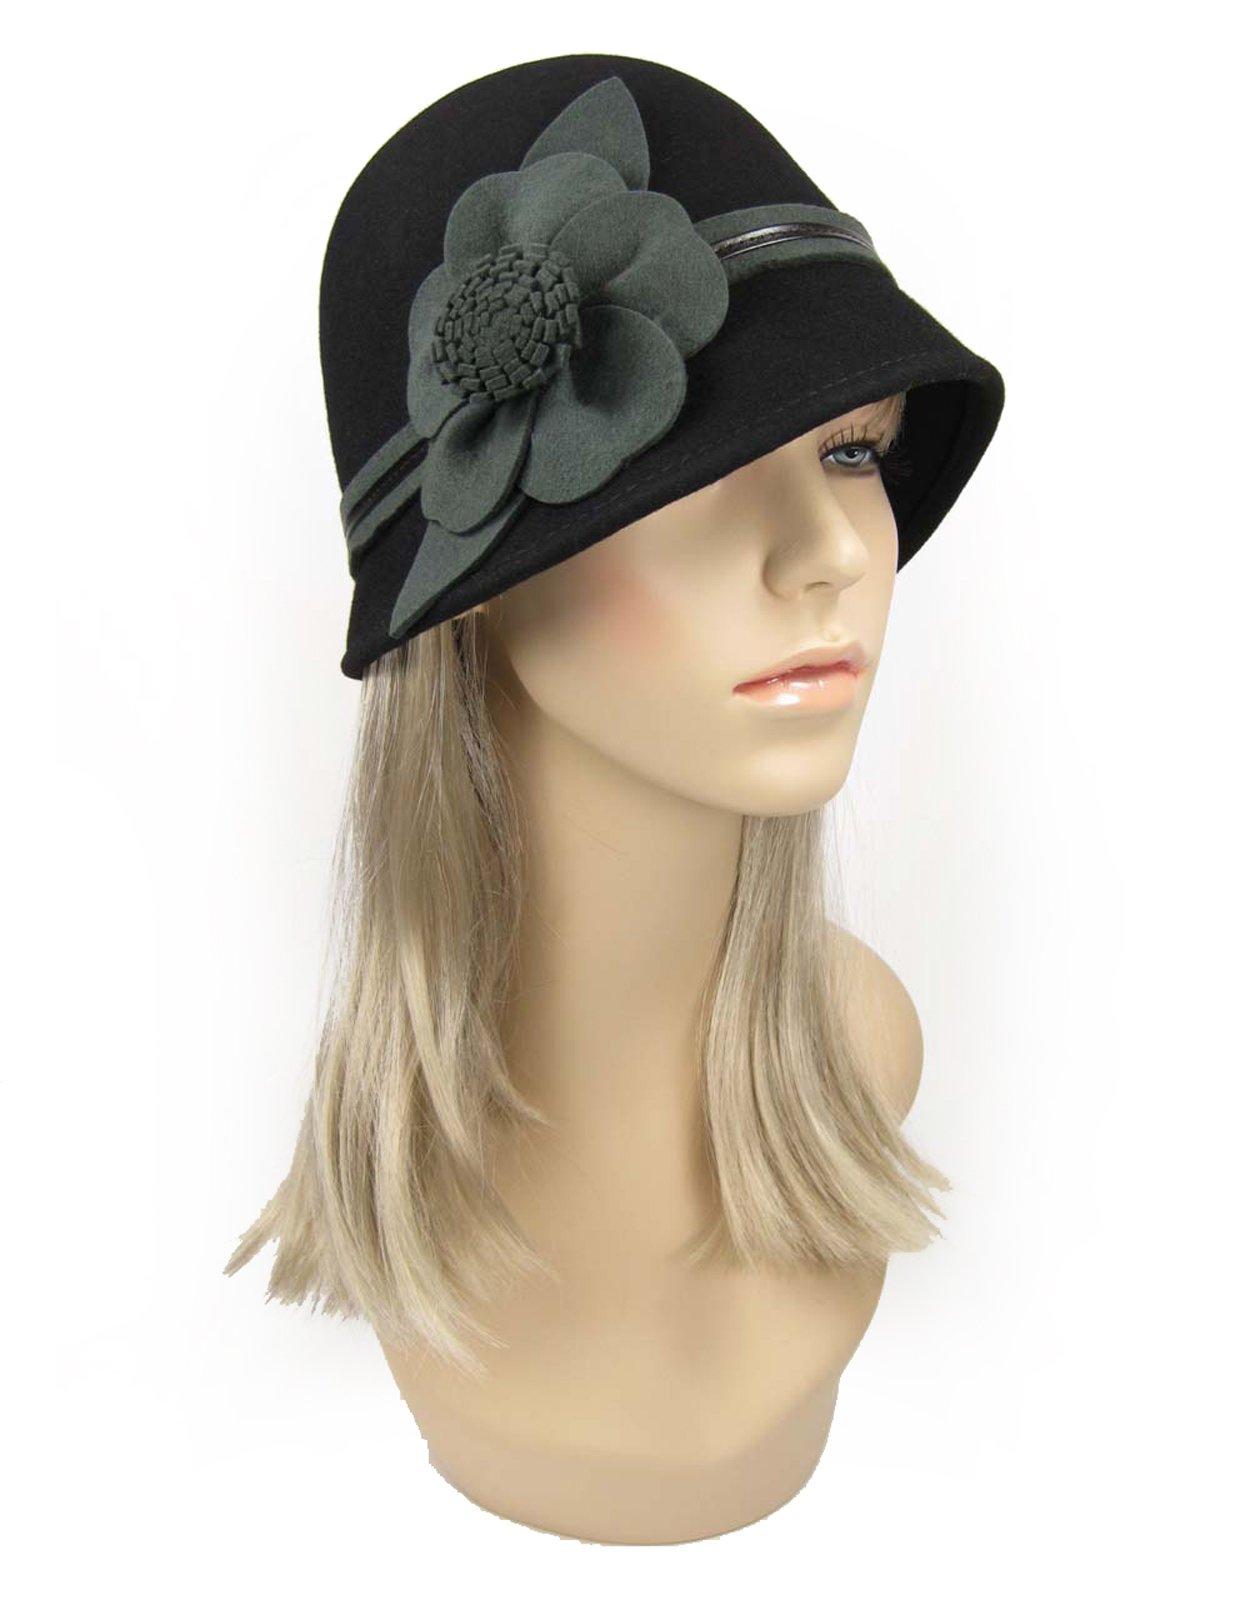 623de02e Galleon - 1920's Style Wool Cloche Bucket Hat With Flower Black ((One Size  (56 Cm - 60 Cm))